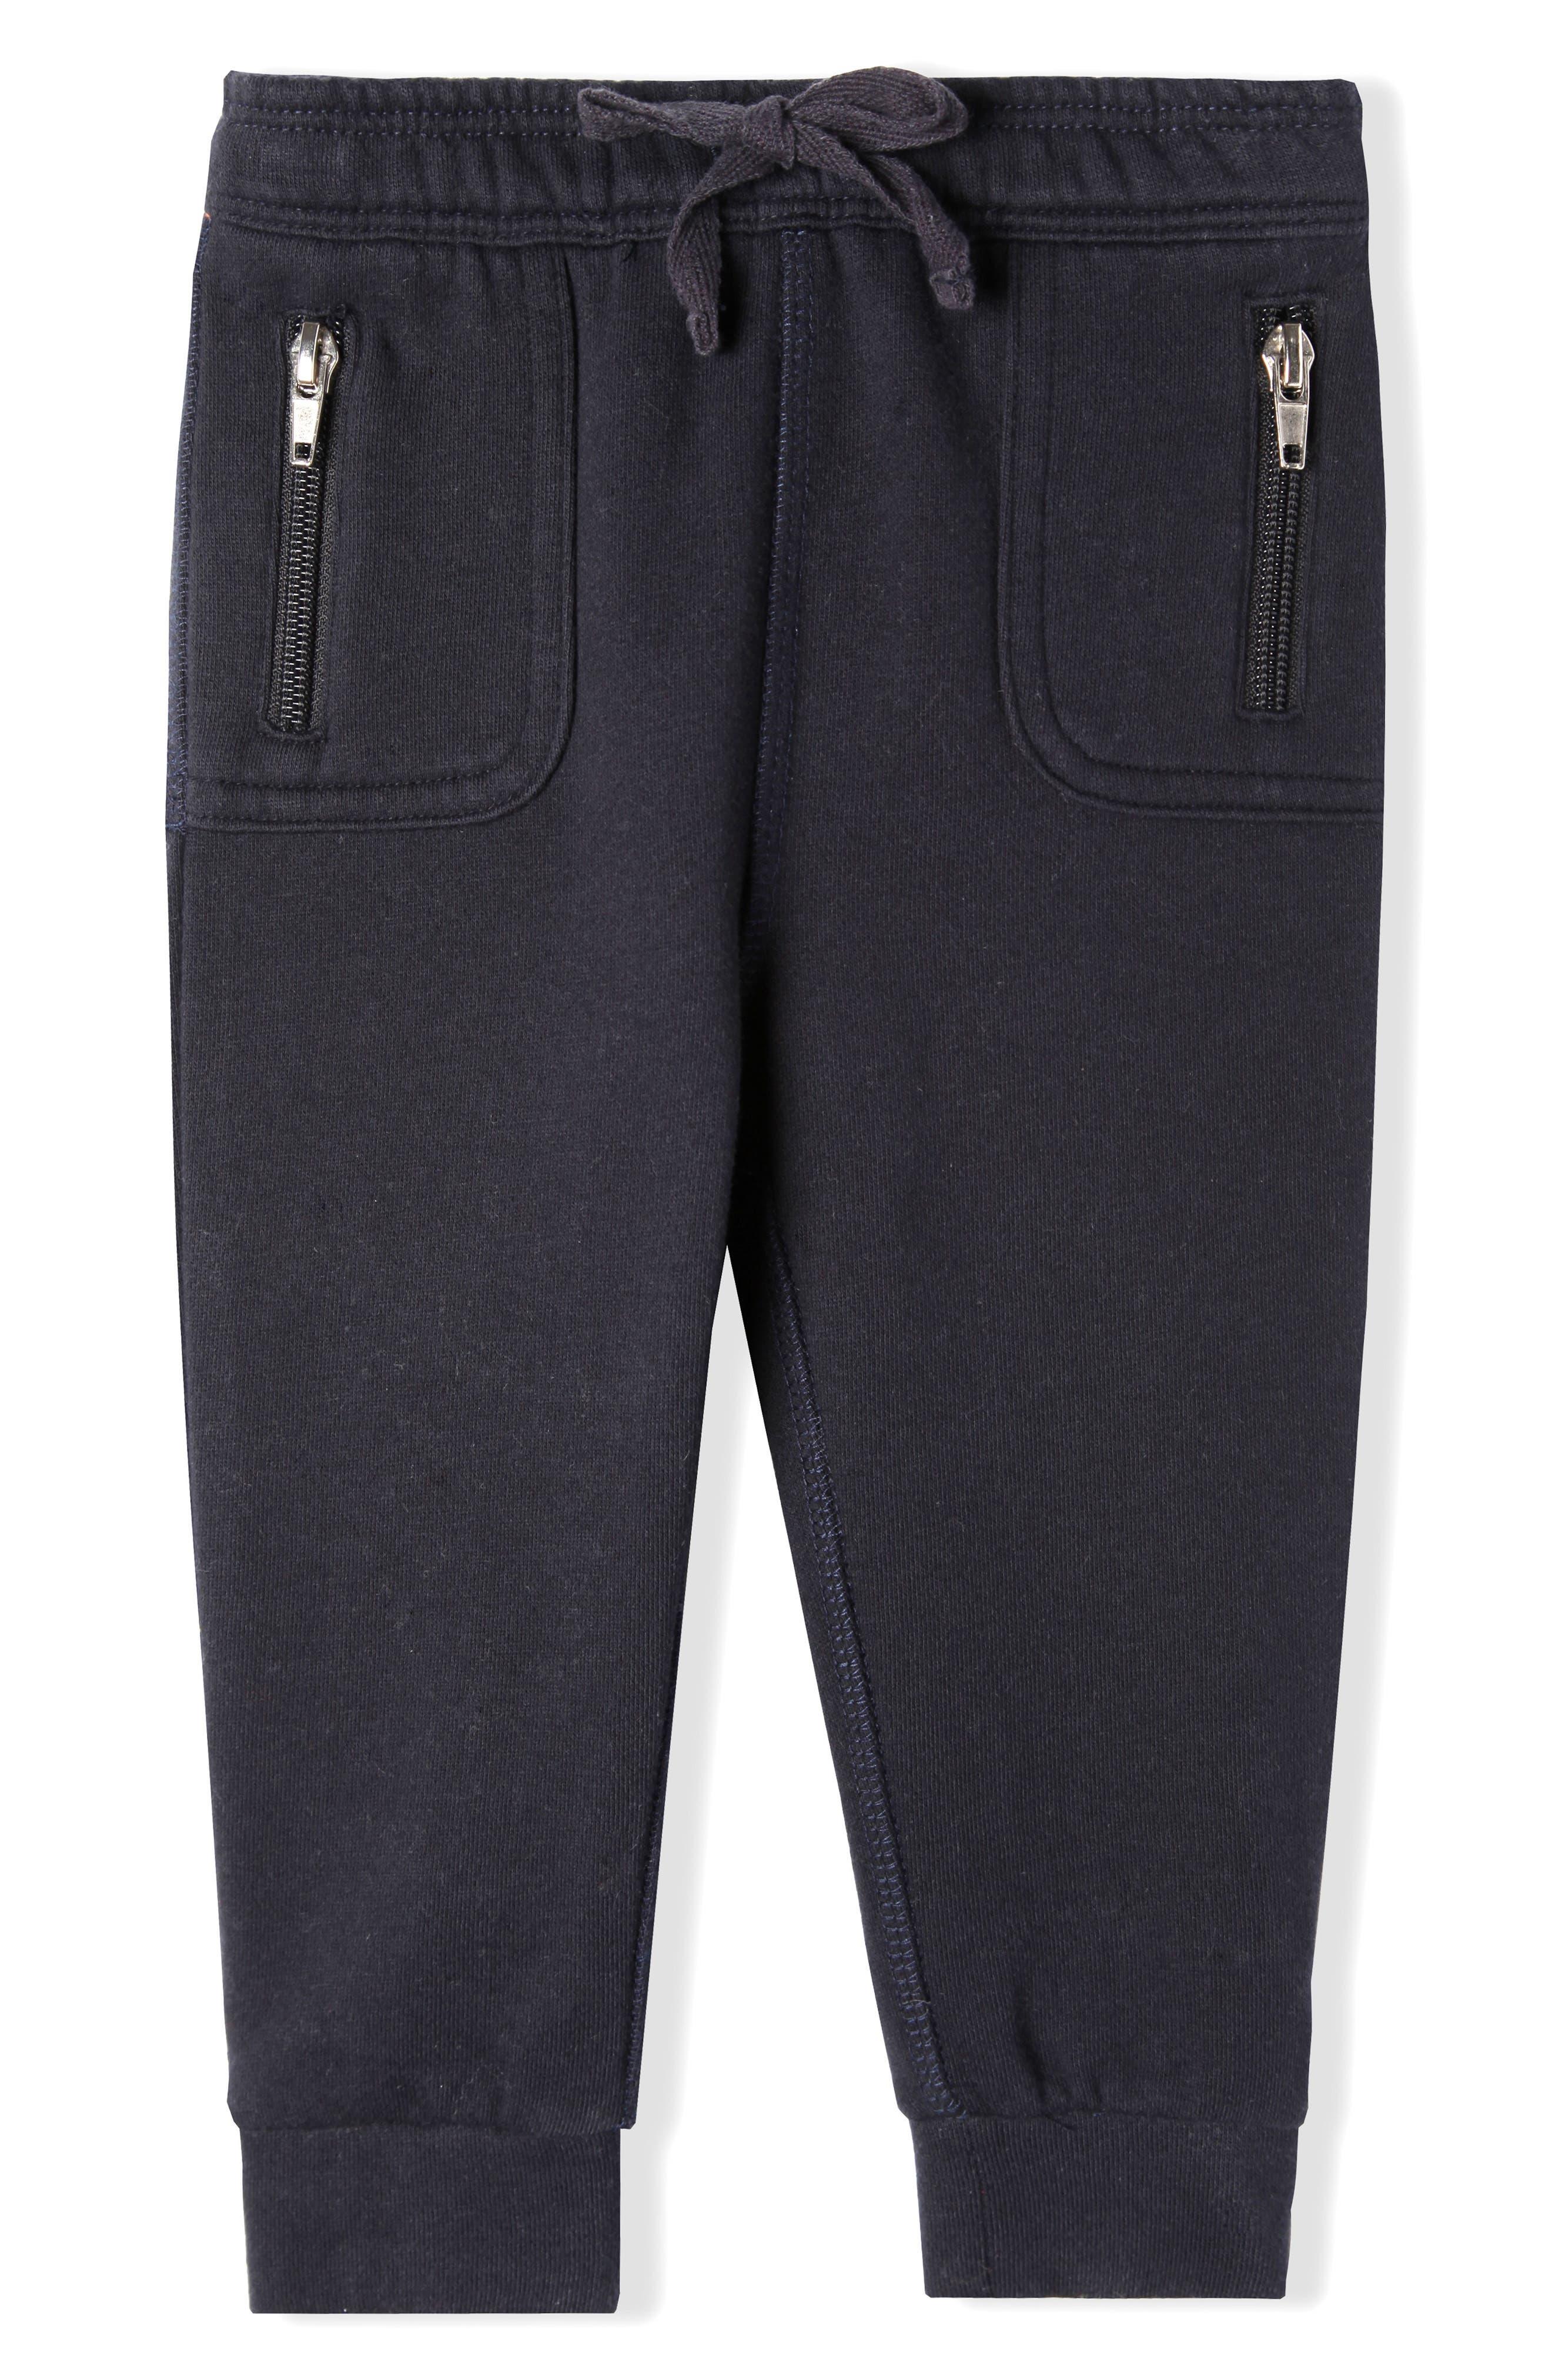 Alternate Image 1 Selected - Art & Eden Mercer Organic Cotton Jogger Pants (Baby Boys)